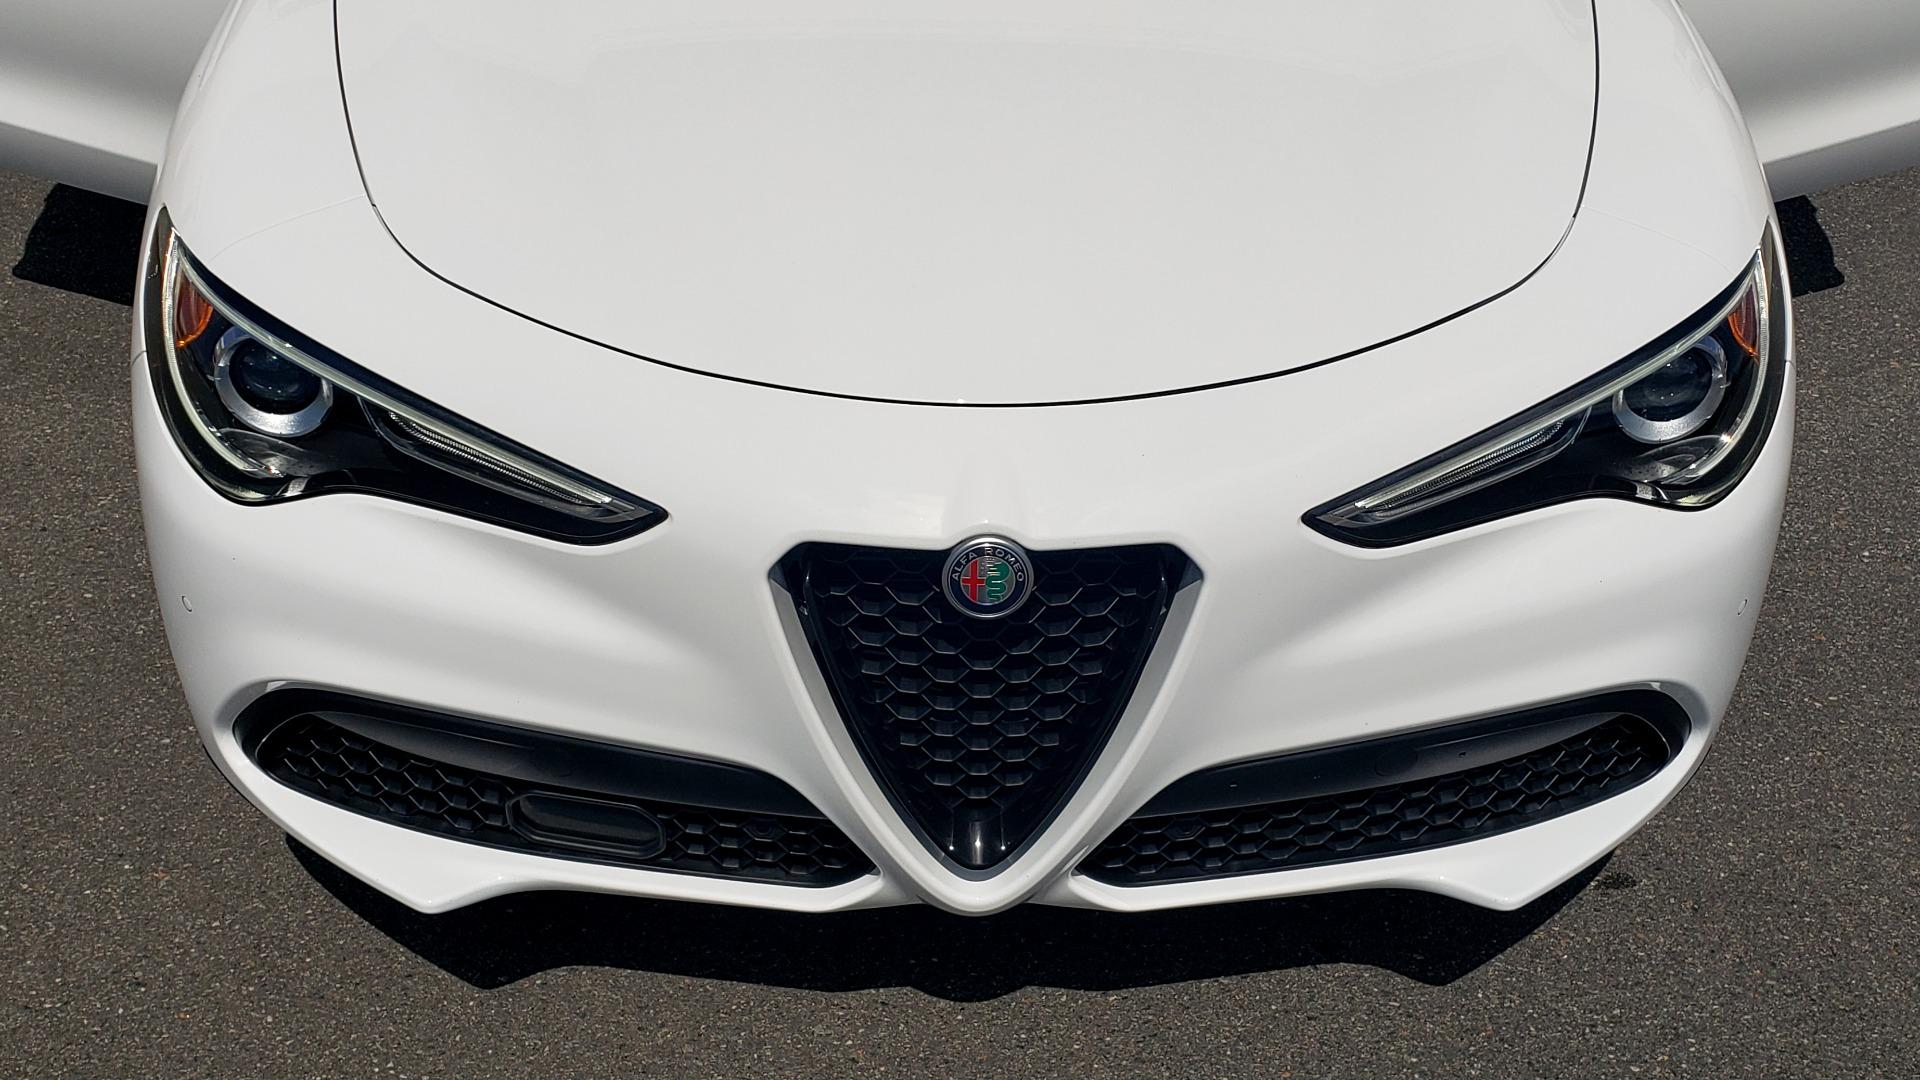 Used 2019 Alfa Romeo STELVIO TI SPORT AWD / 2.0L TURBO / 8-SPD AUTO / DRVR ASST / REARVIEW for sale $37,495 at Formula Imports in Charlotte NC 28227 28